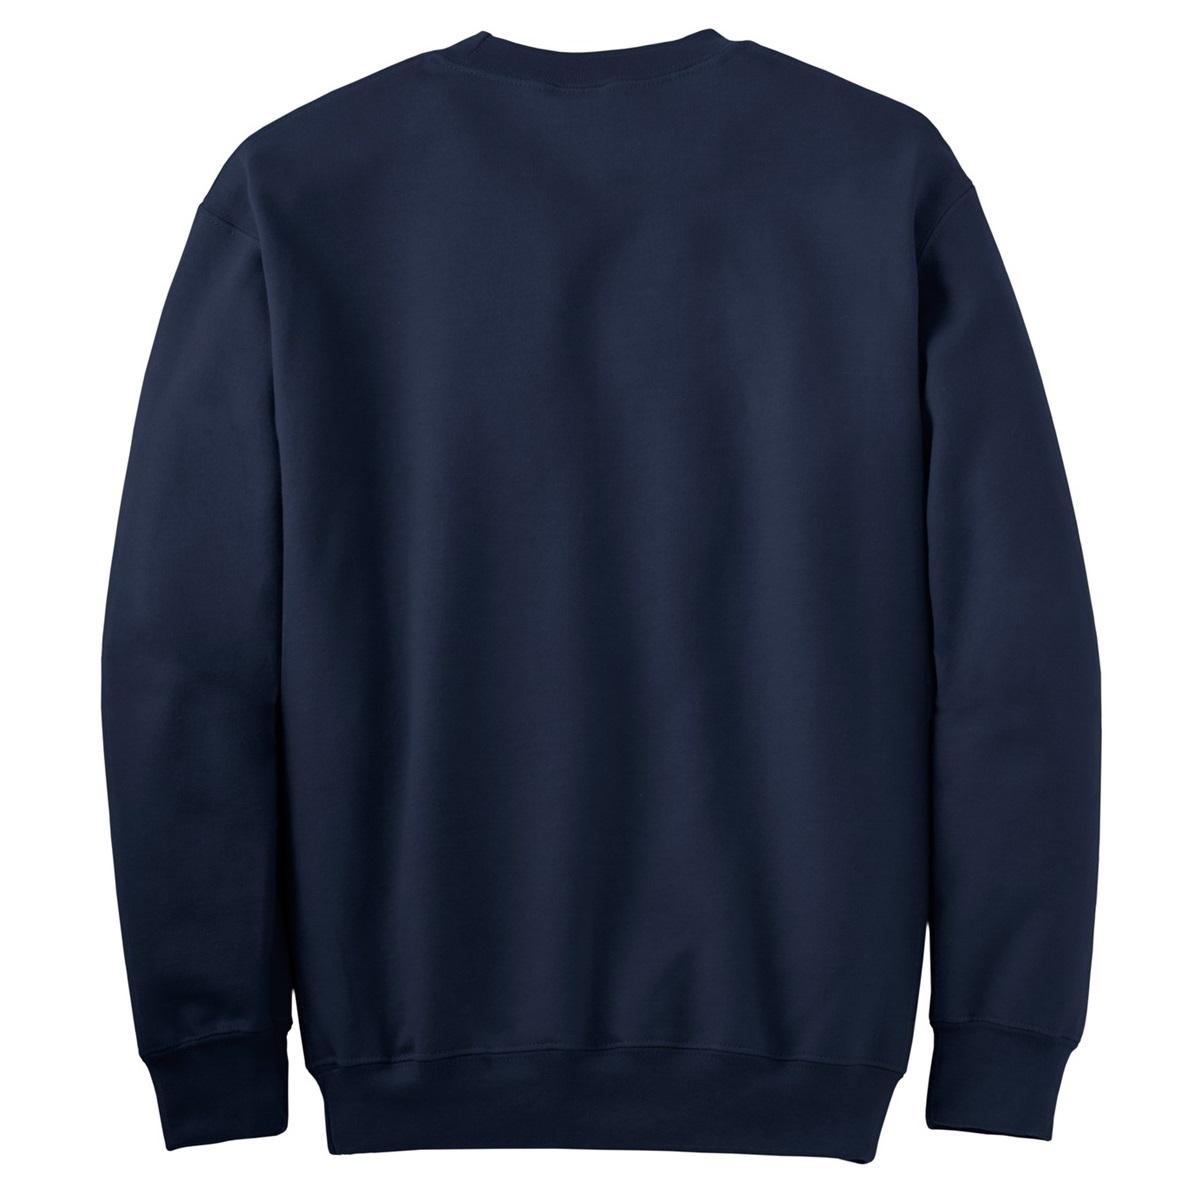 Gildan 12000 DryBlend Crewneck Sweatshirt - Navy | FullSource.com